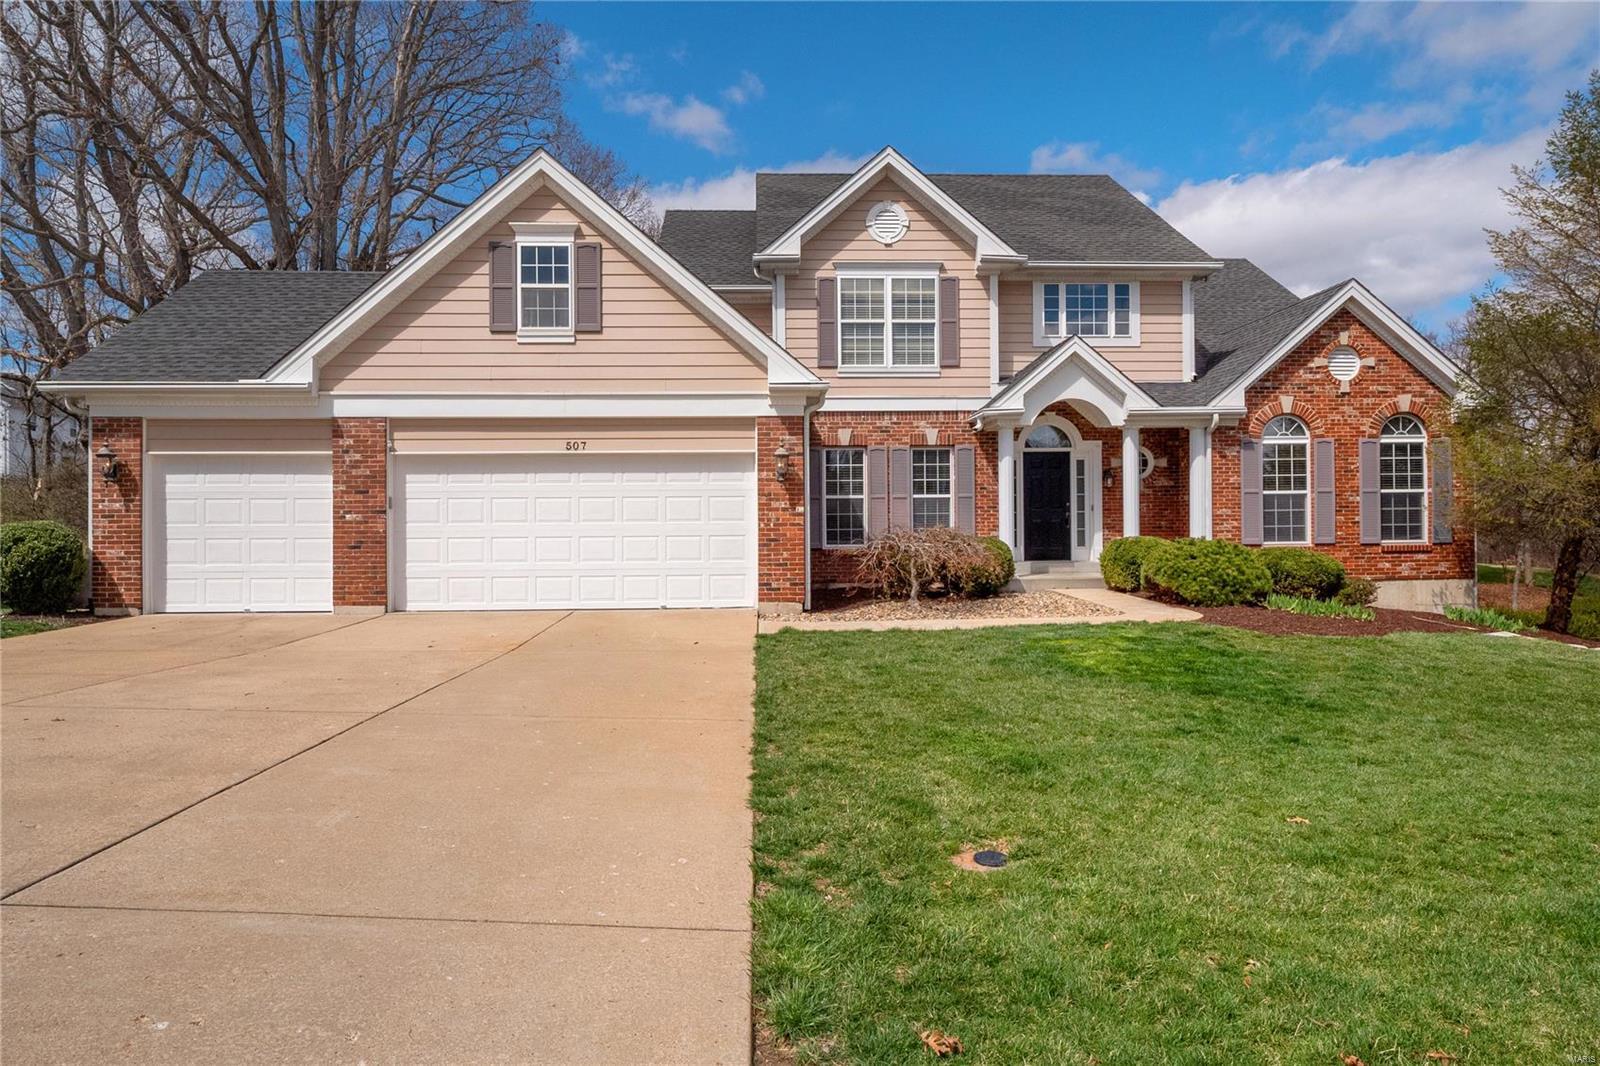 507 Sumac Field Court Property Photo - Ellisville, MO real estate listing